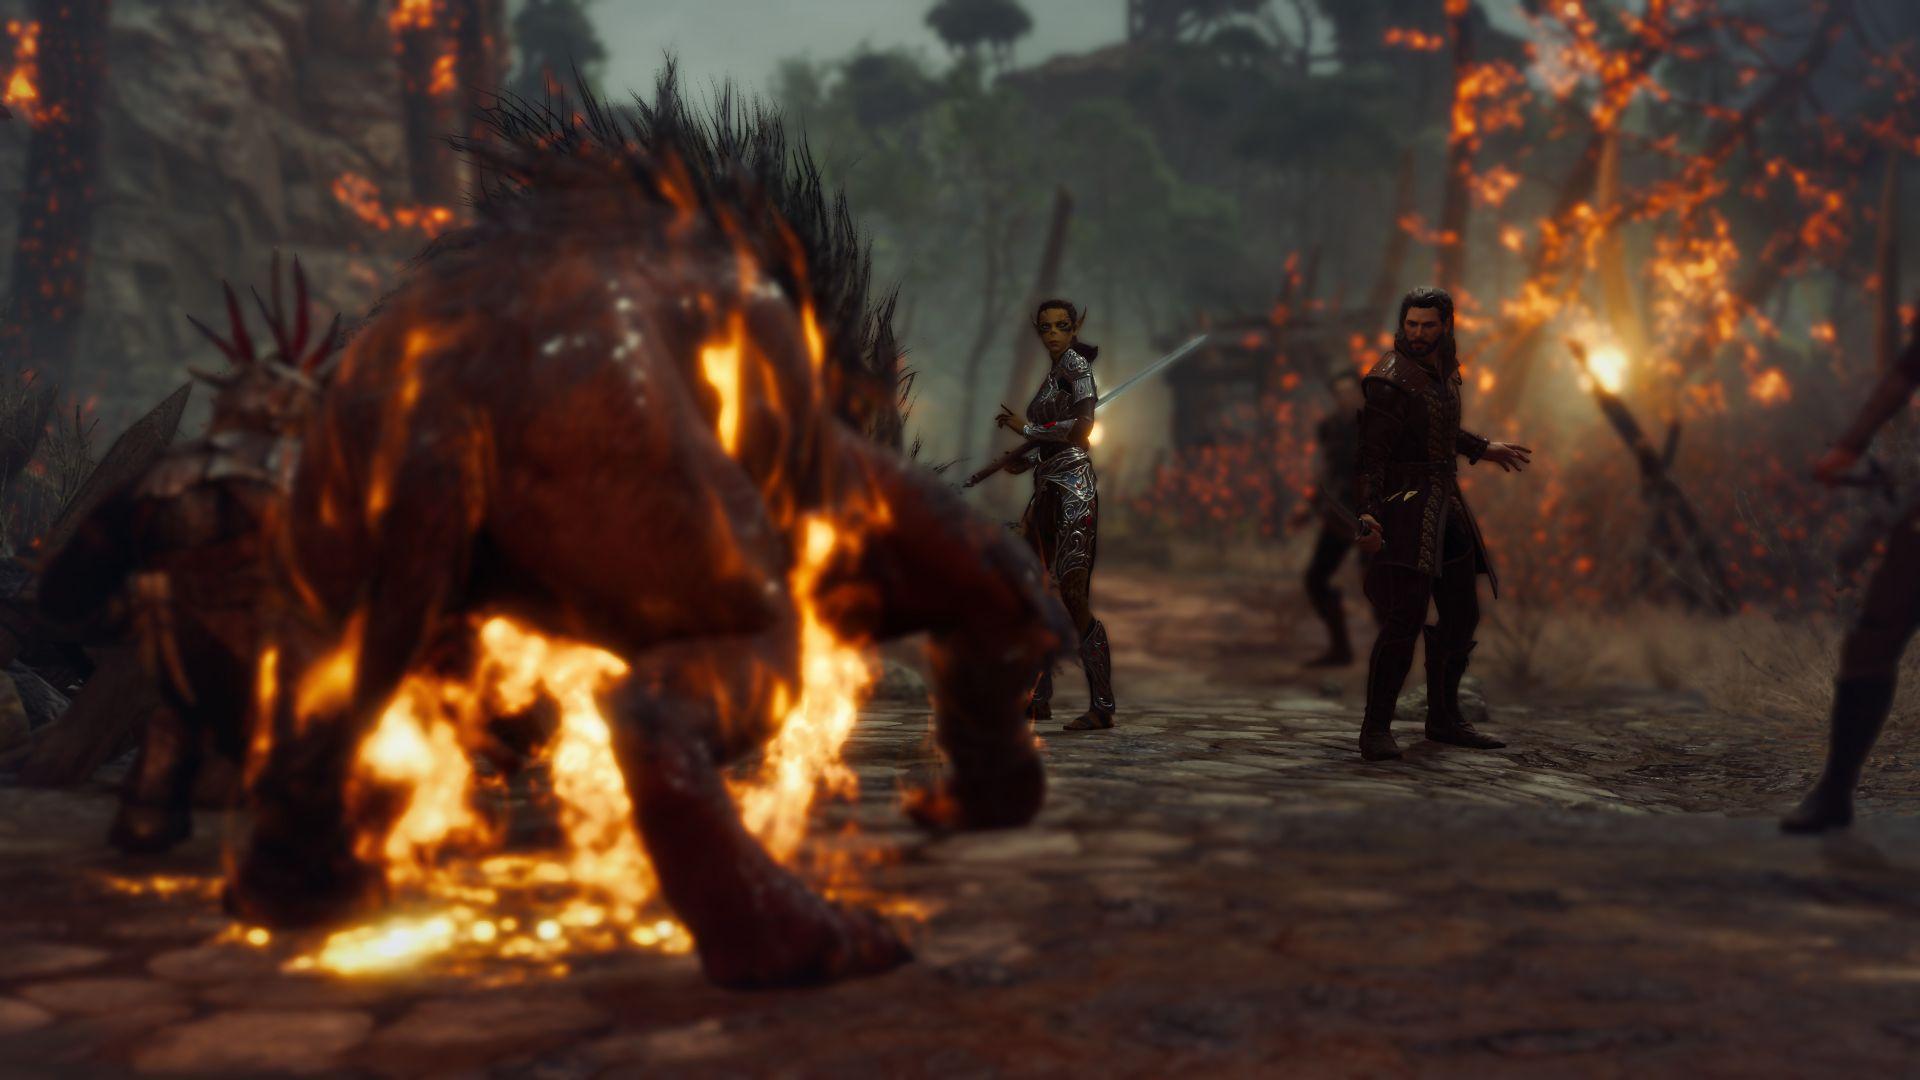 Baldur S Gate 3 Will Have Romance Options Developer Confirms